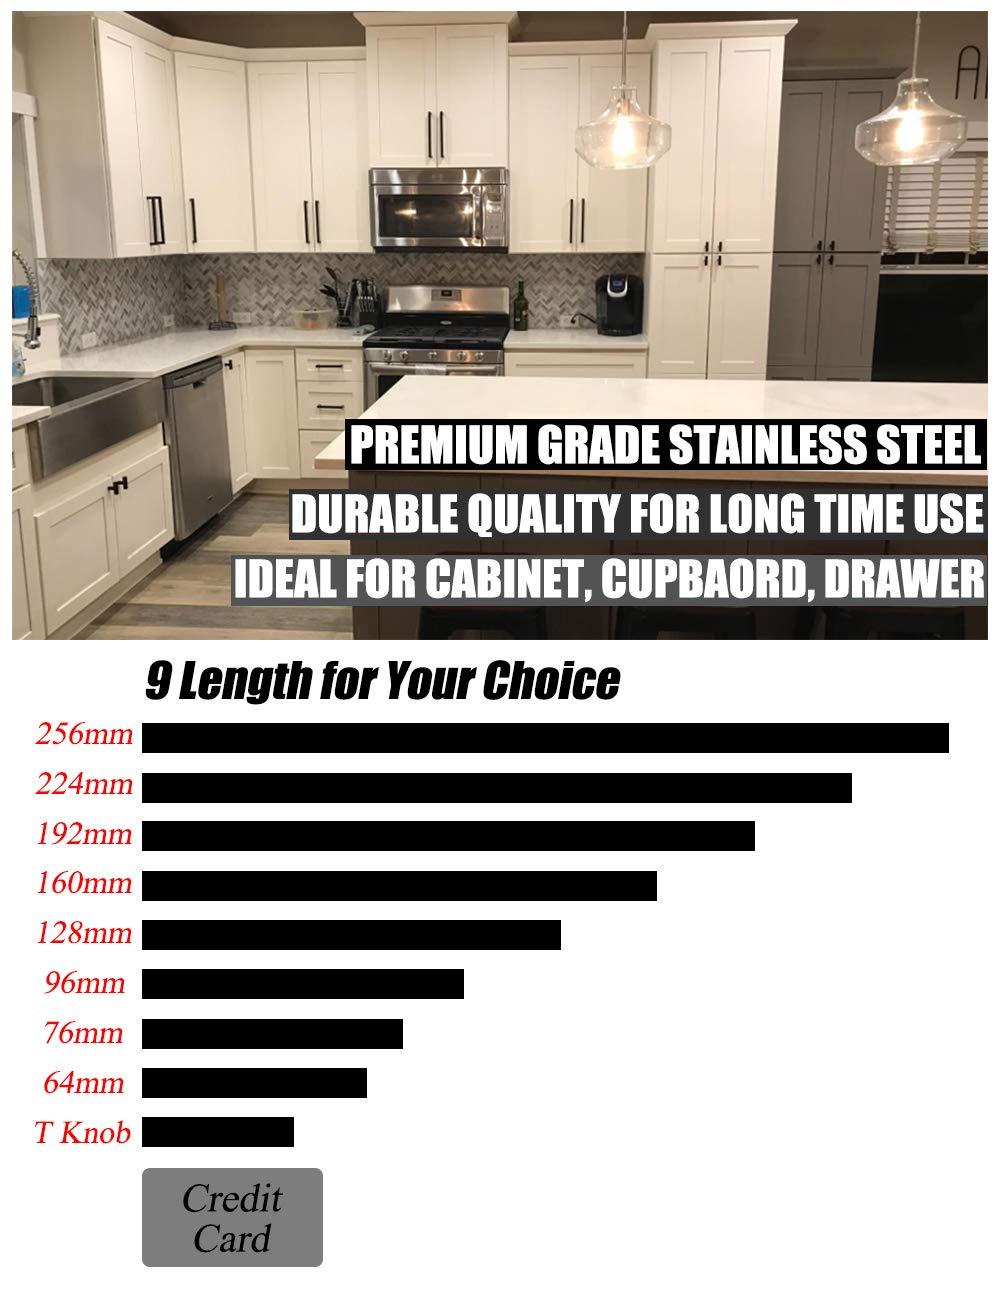 PinLin Lot de 10 Poignee de Meuble Cuisine 96mm Entraxe de trou Poignee de Porte Meuble Poign/ée de Acier Inoxydable Vis inclus